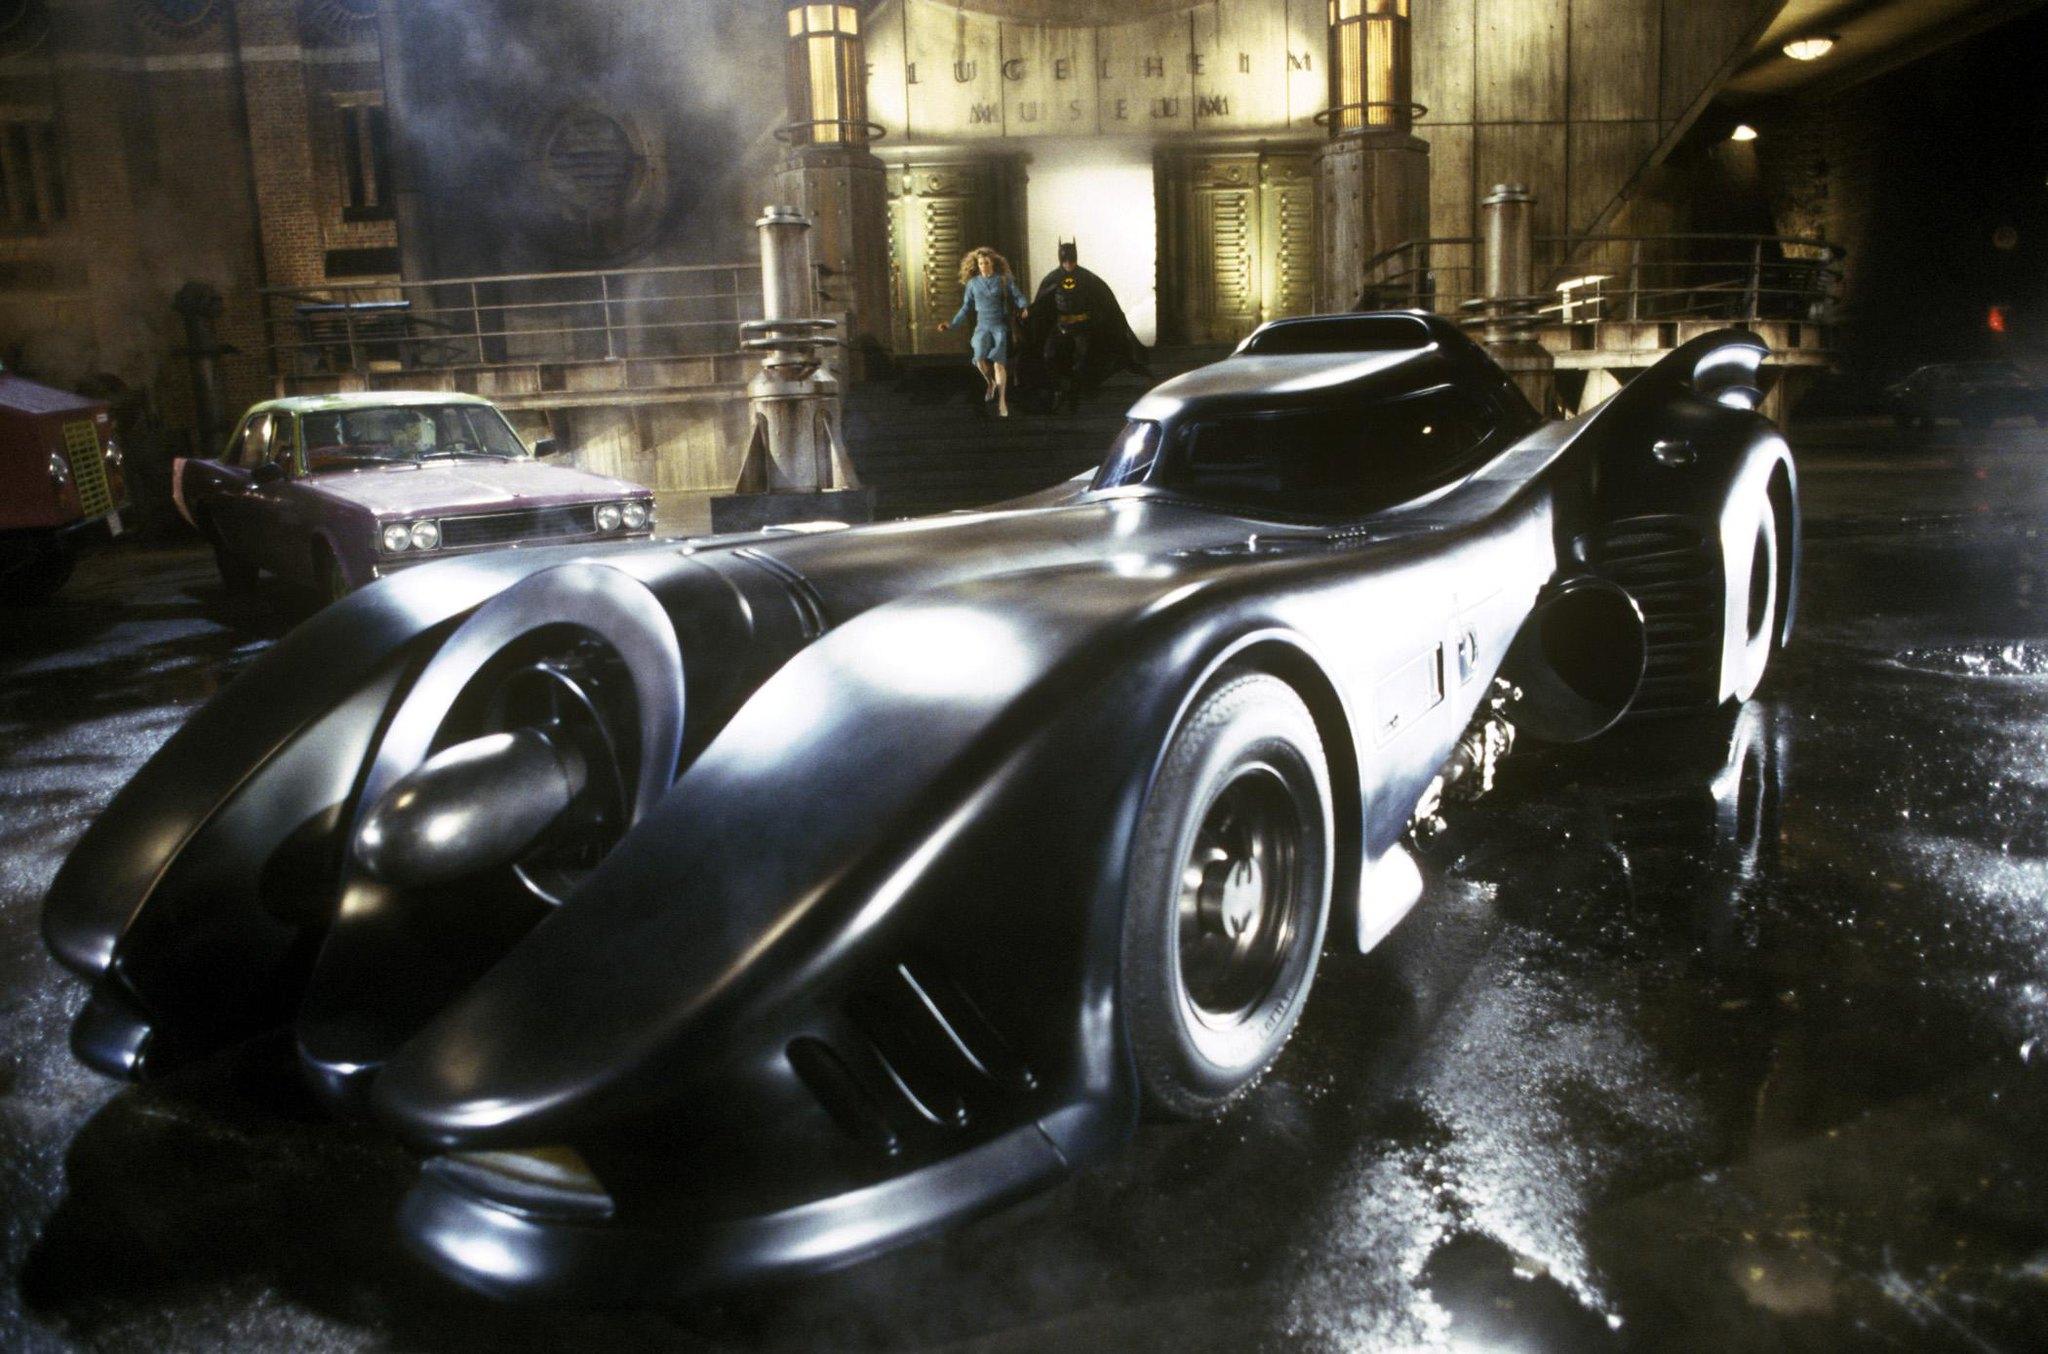 #Fave80sCar Batman 1989 Batmobile